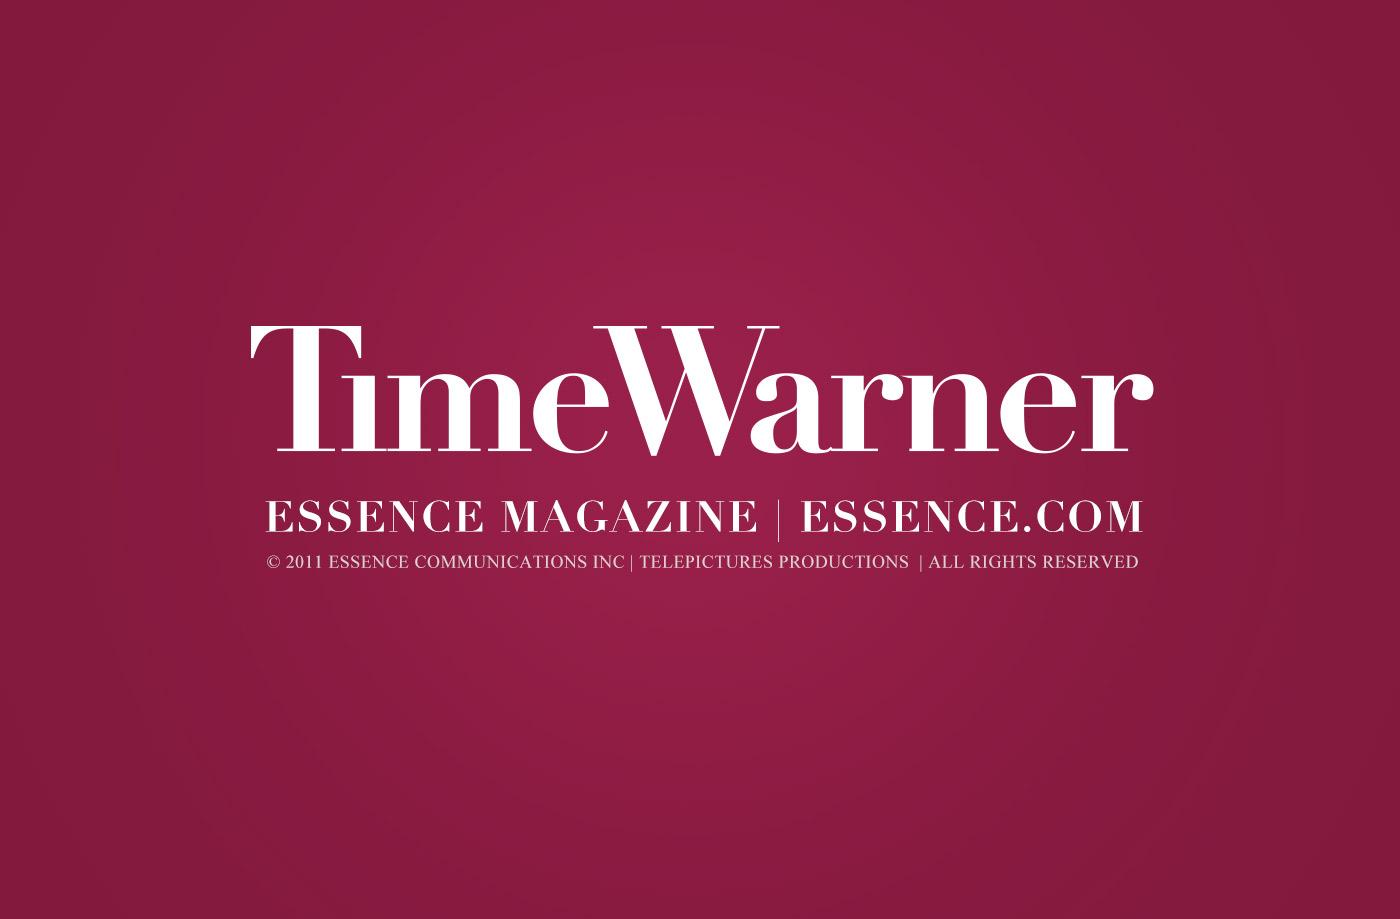 essence-website-1